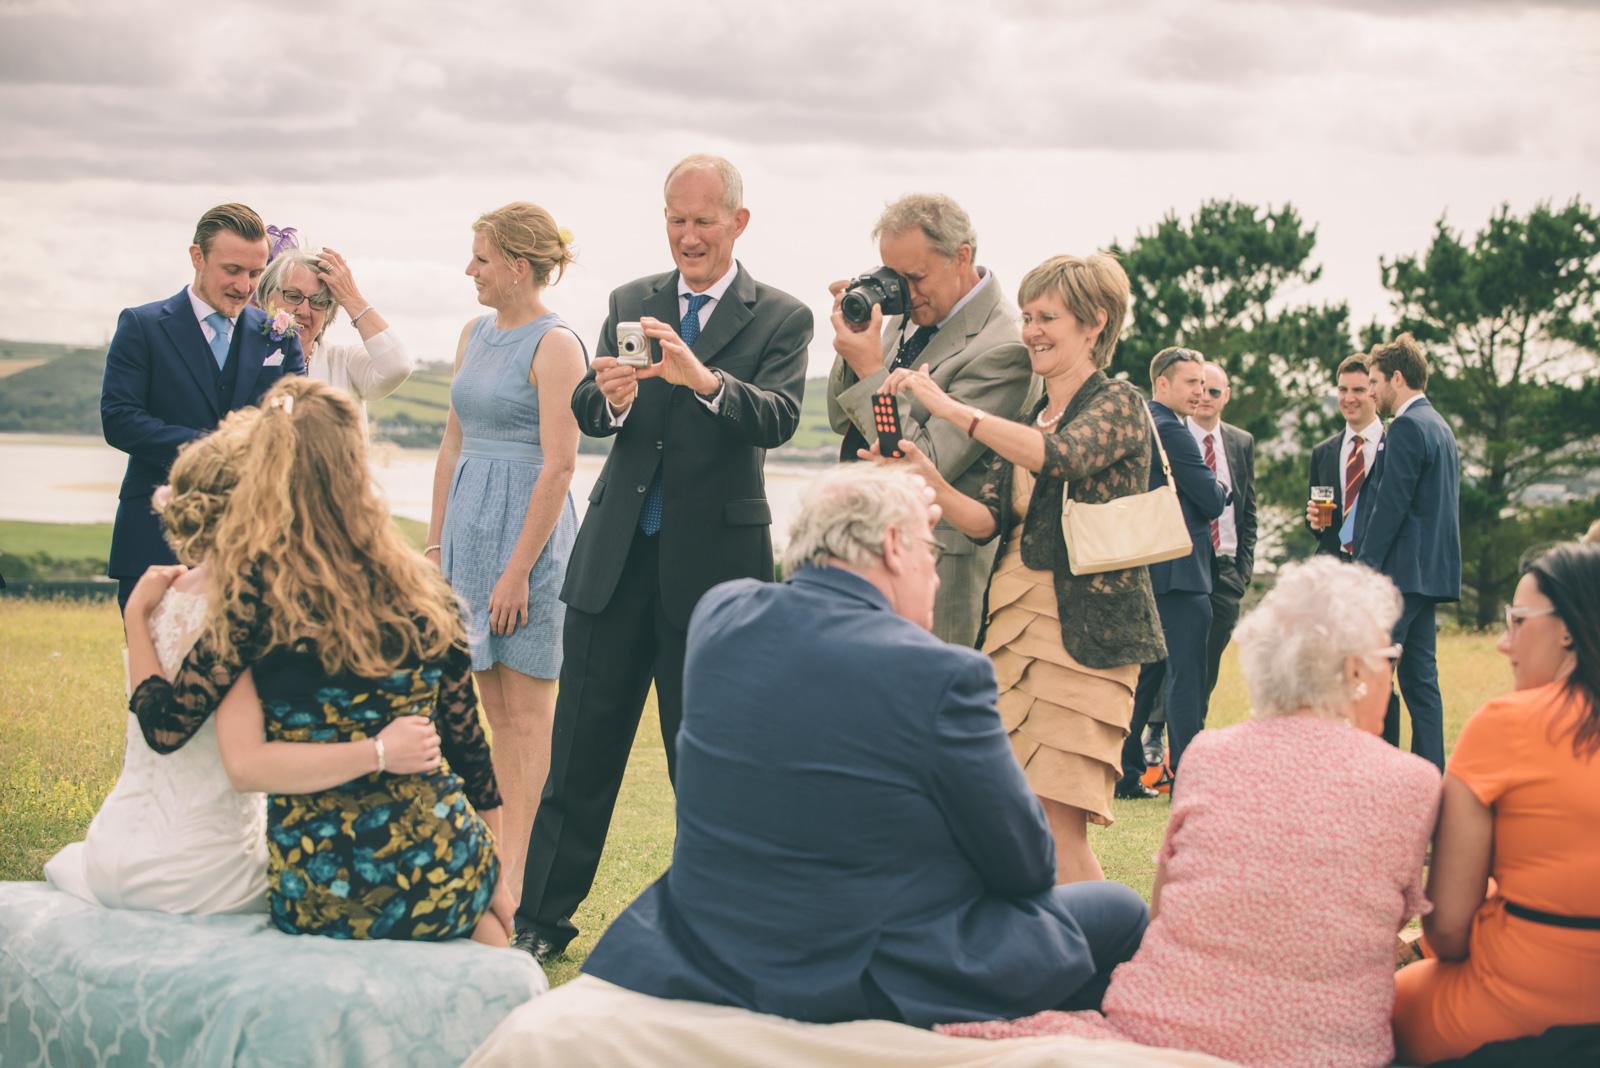 wedding-photography-rock-128.jpg